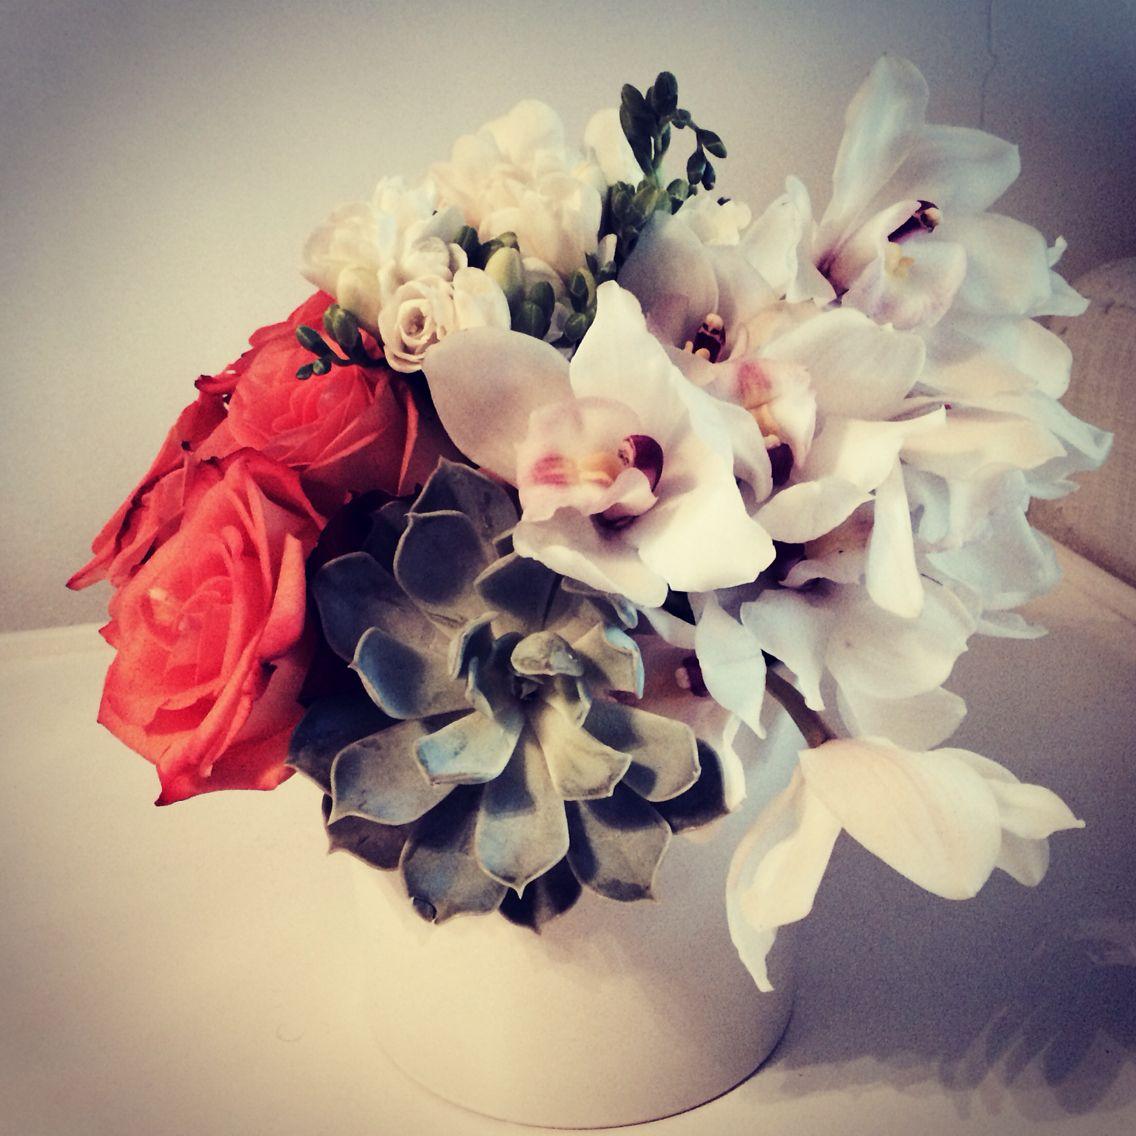 Flower Arrangement With Succulents Cymbidium Orchids And Roses Flower Arrangements Cymbidium Orchids Flower Arrangement Designs